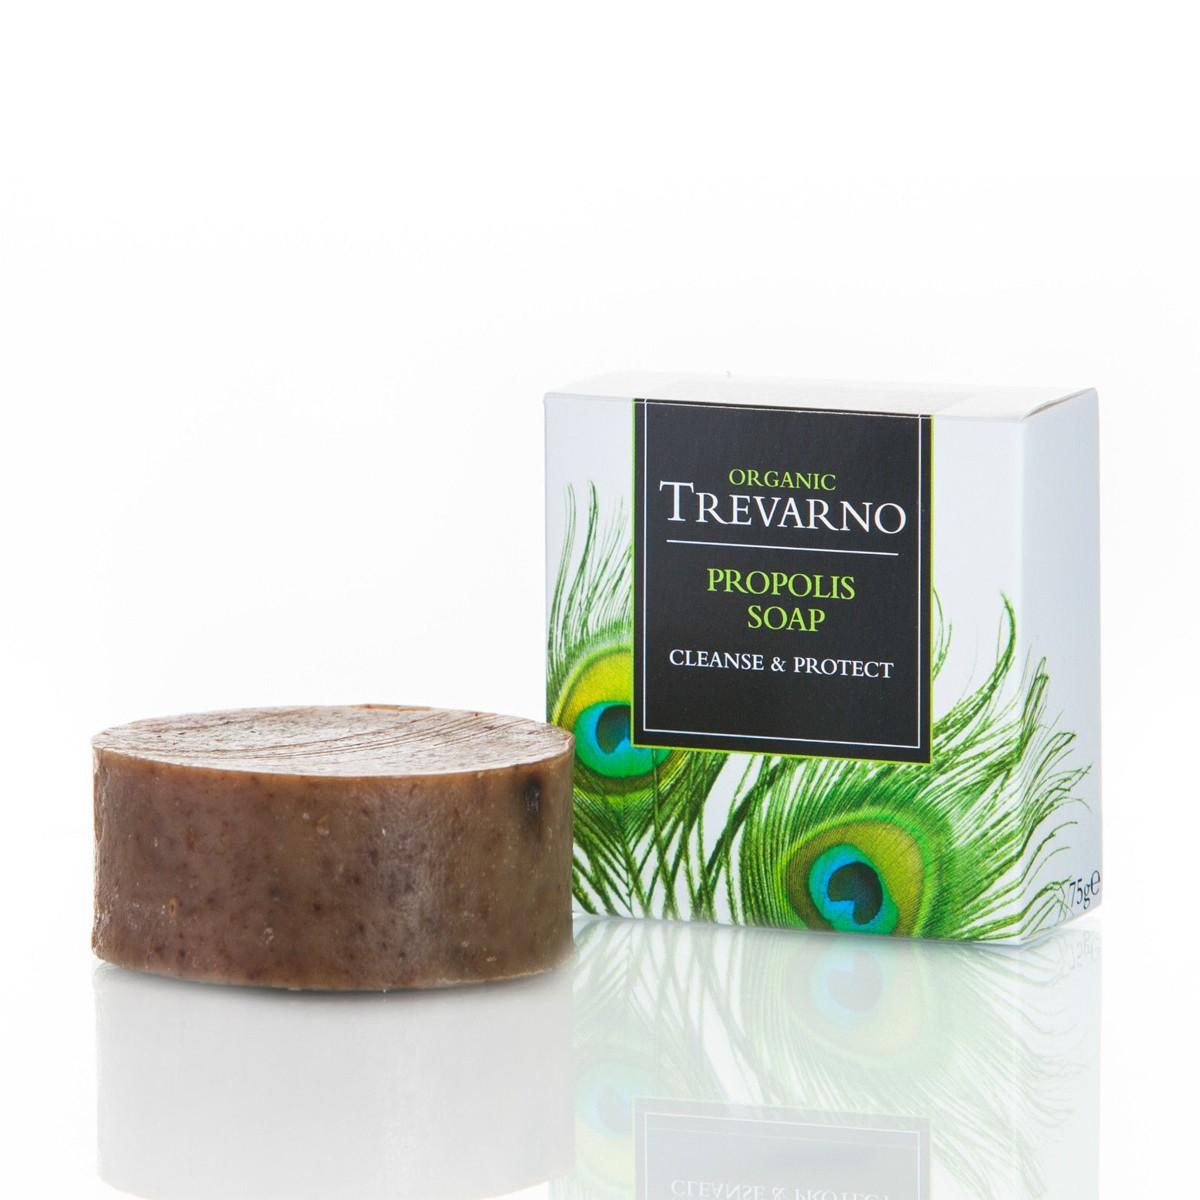 Organic Trevarno Organic Propolis Soap